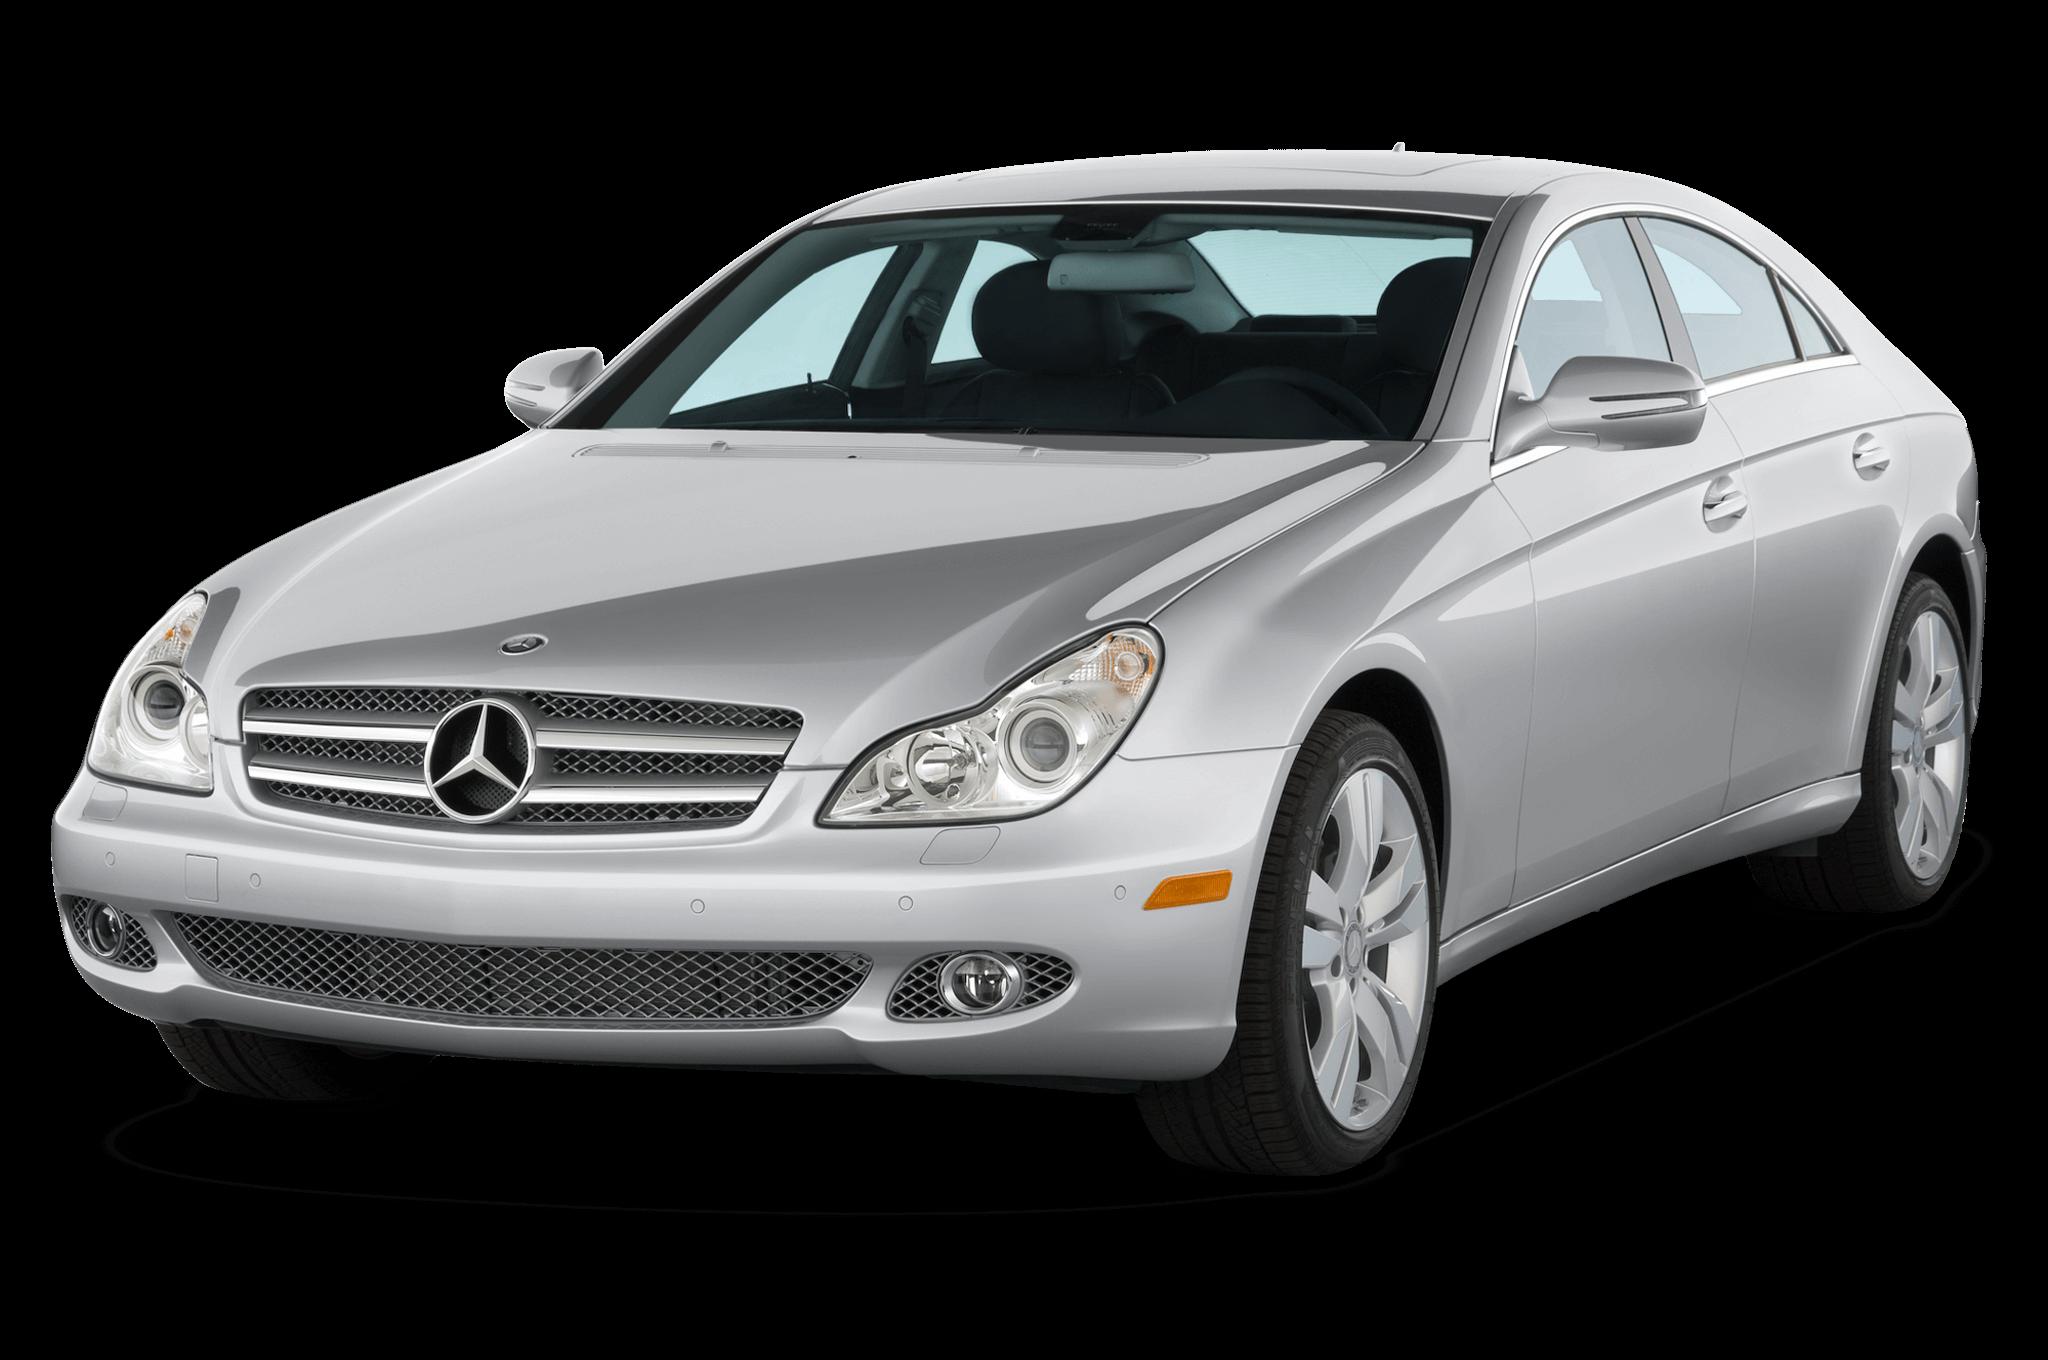 Mercedes-Benz CLS550 automobilio nuoma